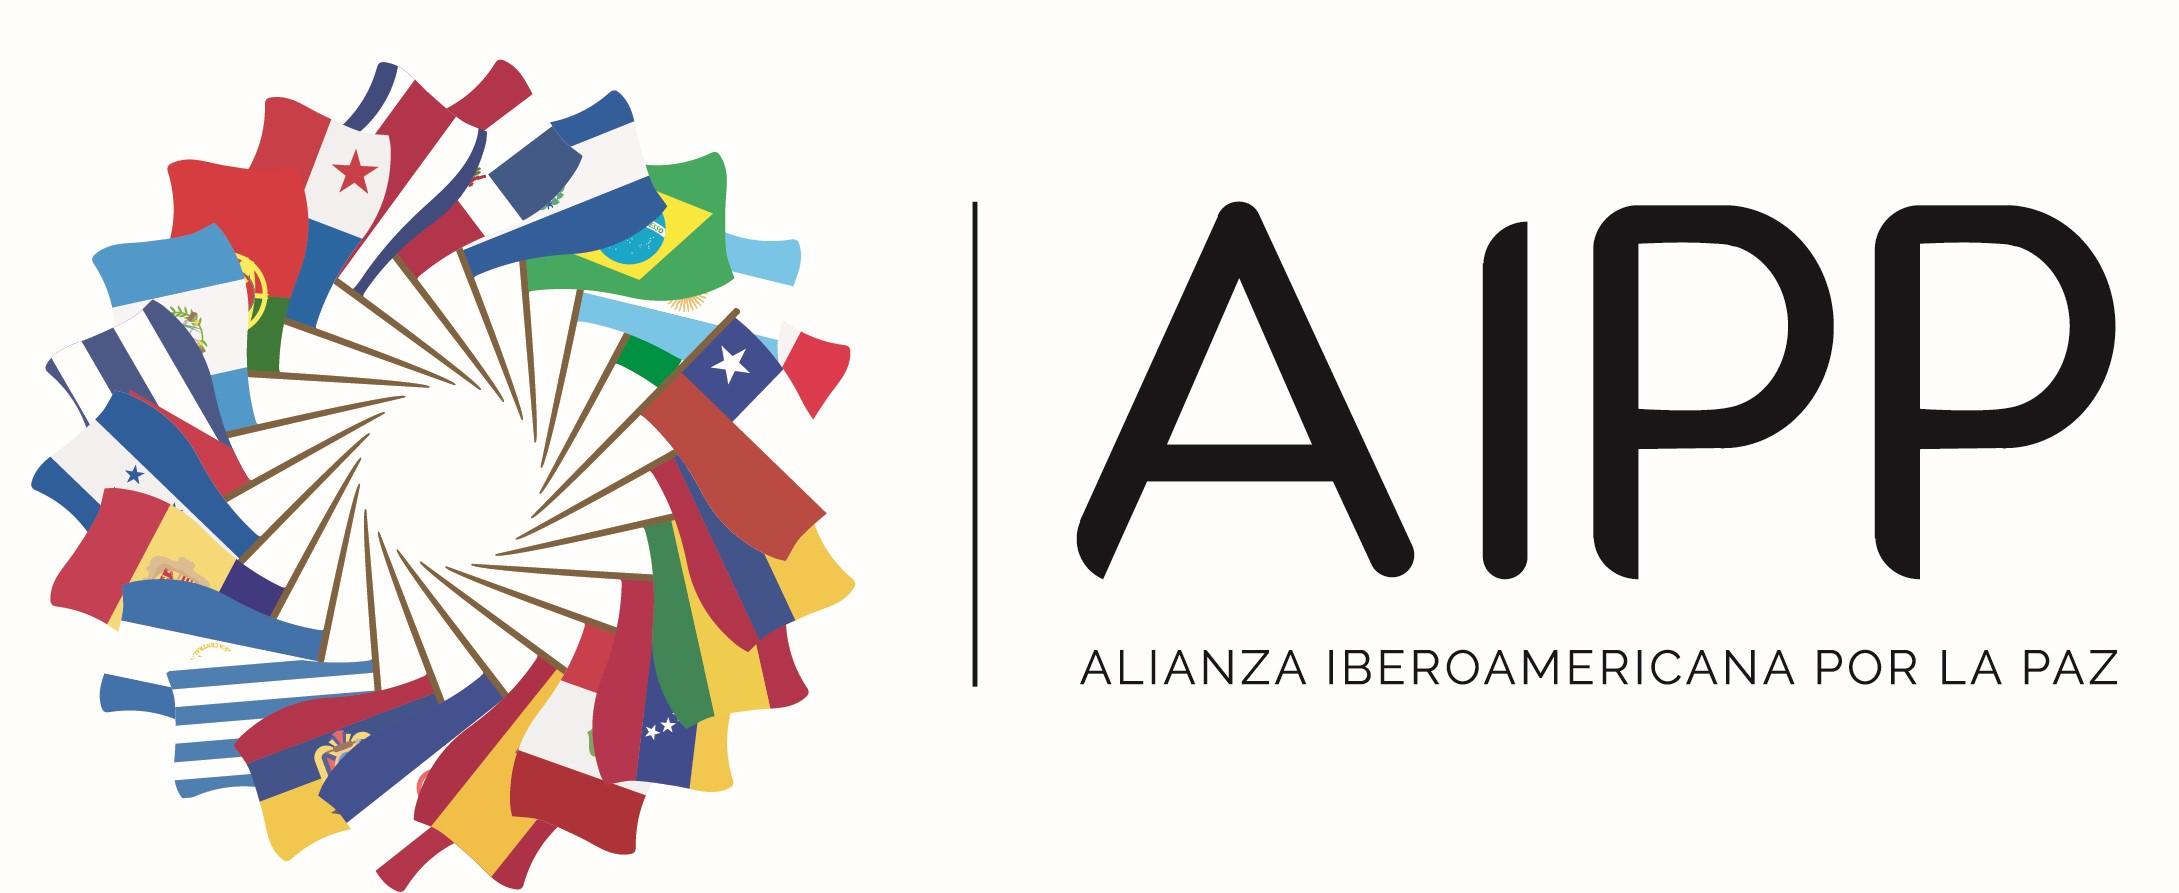 Alianza Iberoamericana por la Paz – AIPP